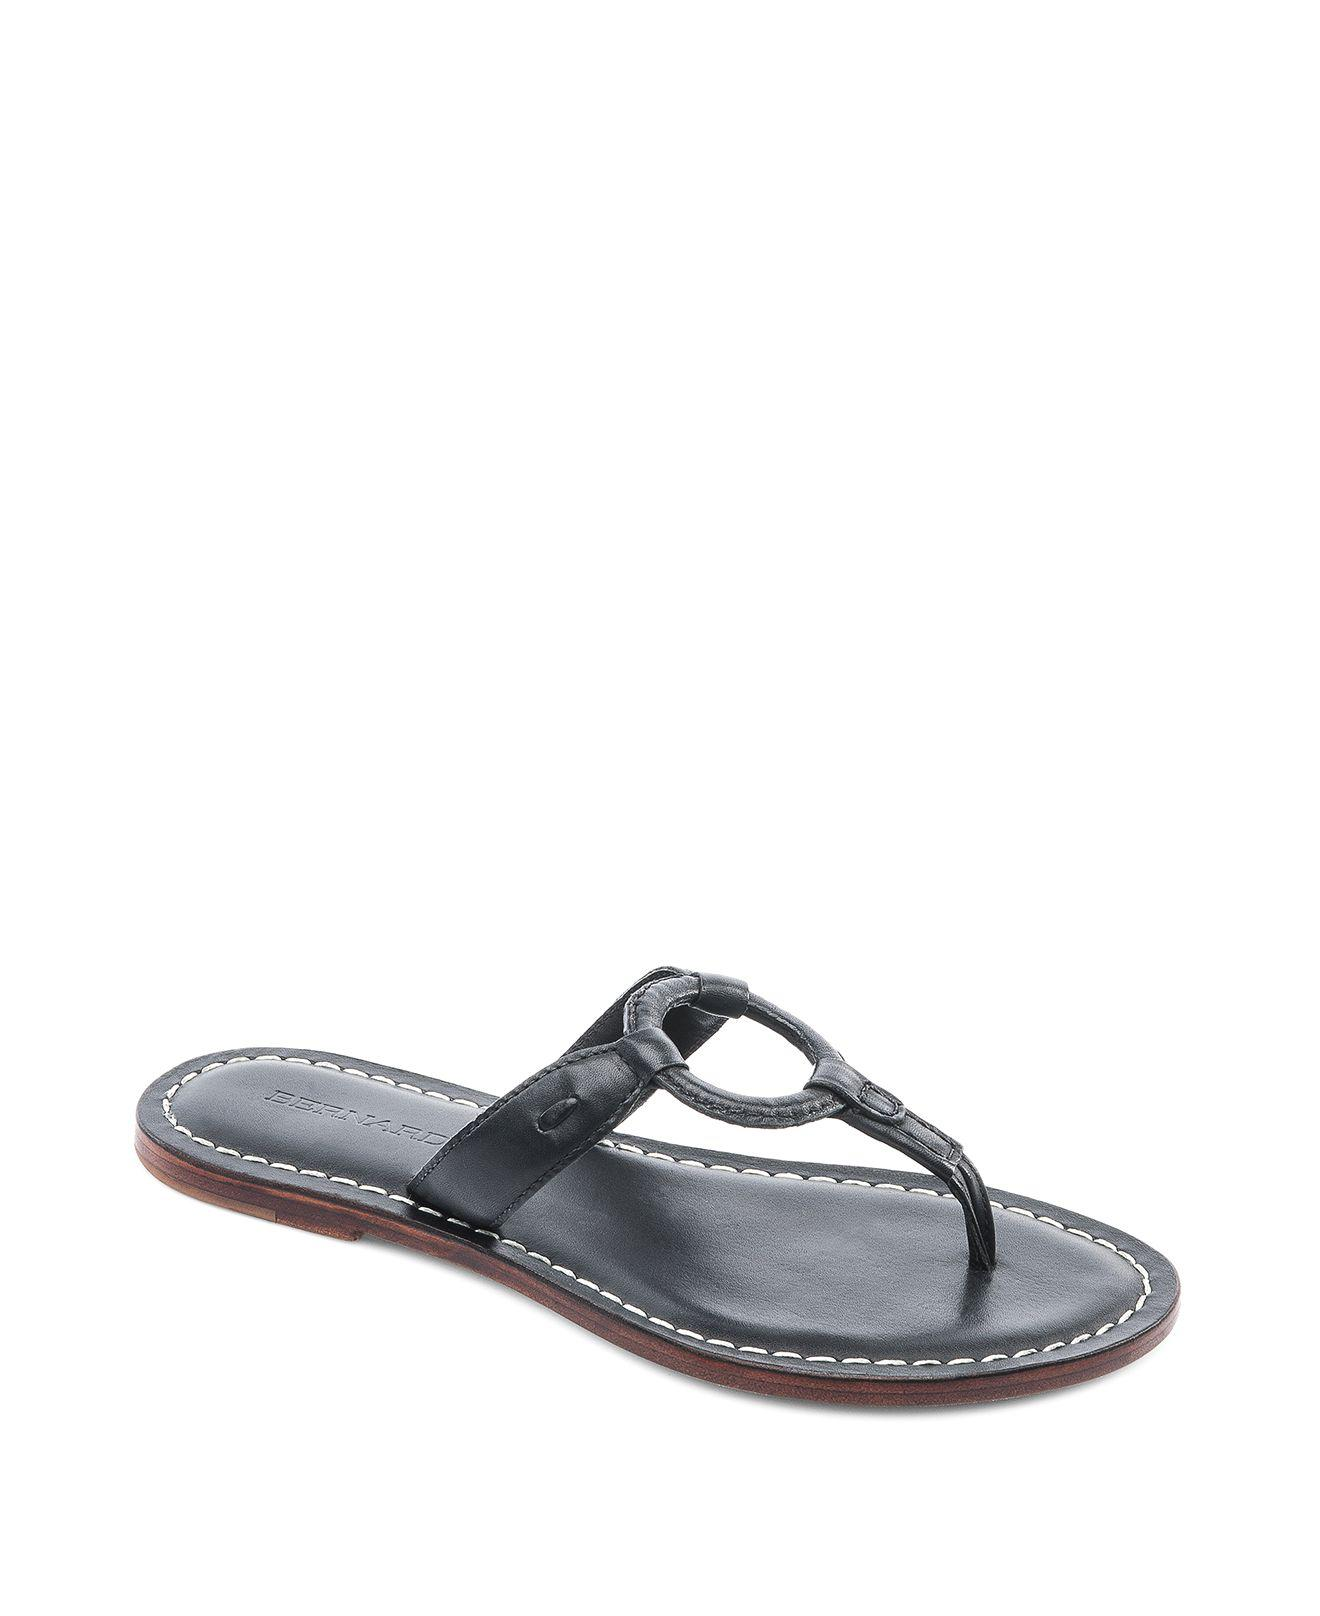 0e4a4bab17a Lyst - Bernardo Matrix Thong Sandals in Black